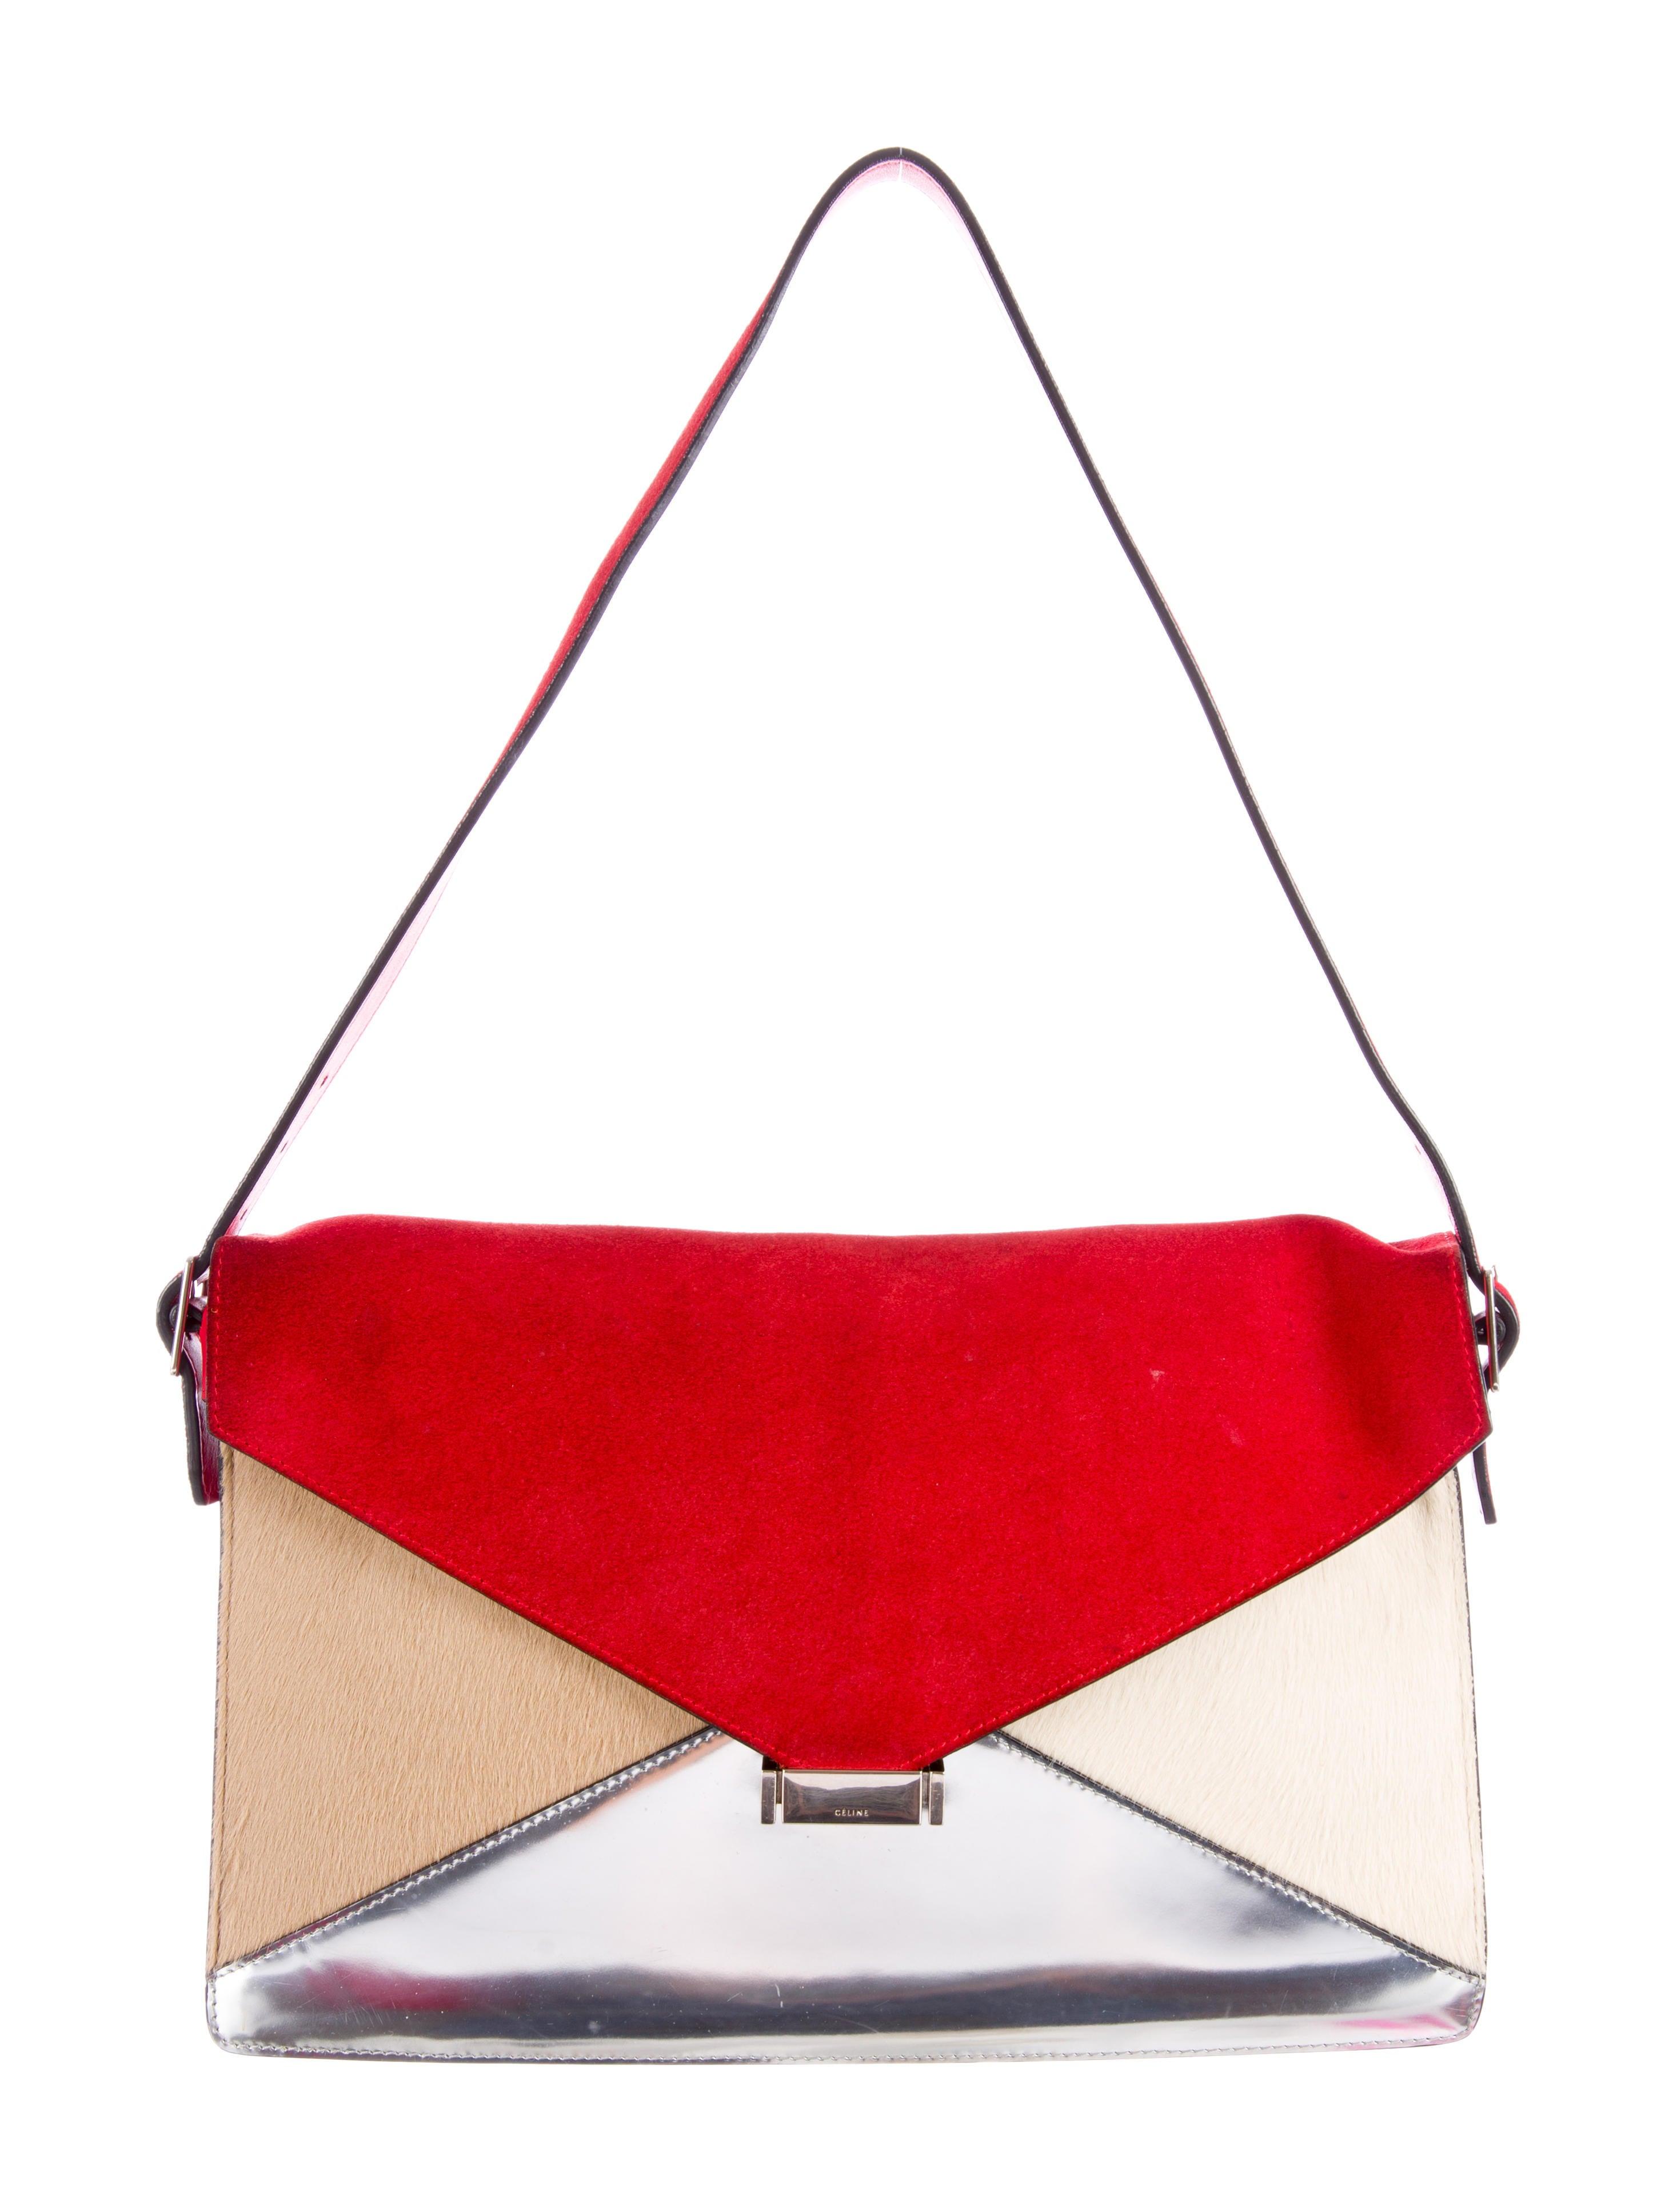 C¨¦line Diamond Shoulder Bag - Handbags - CEL26592 | The RealReal